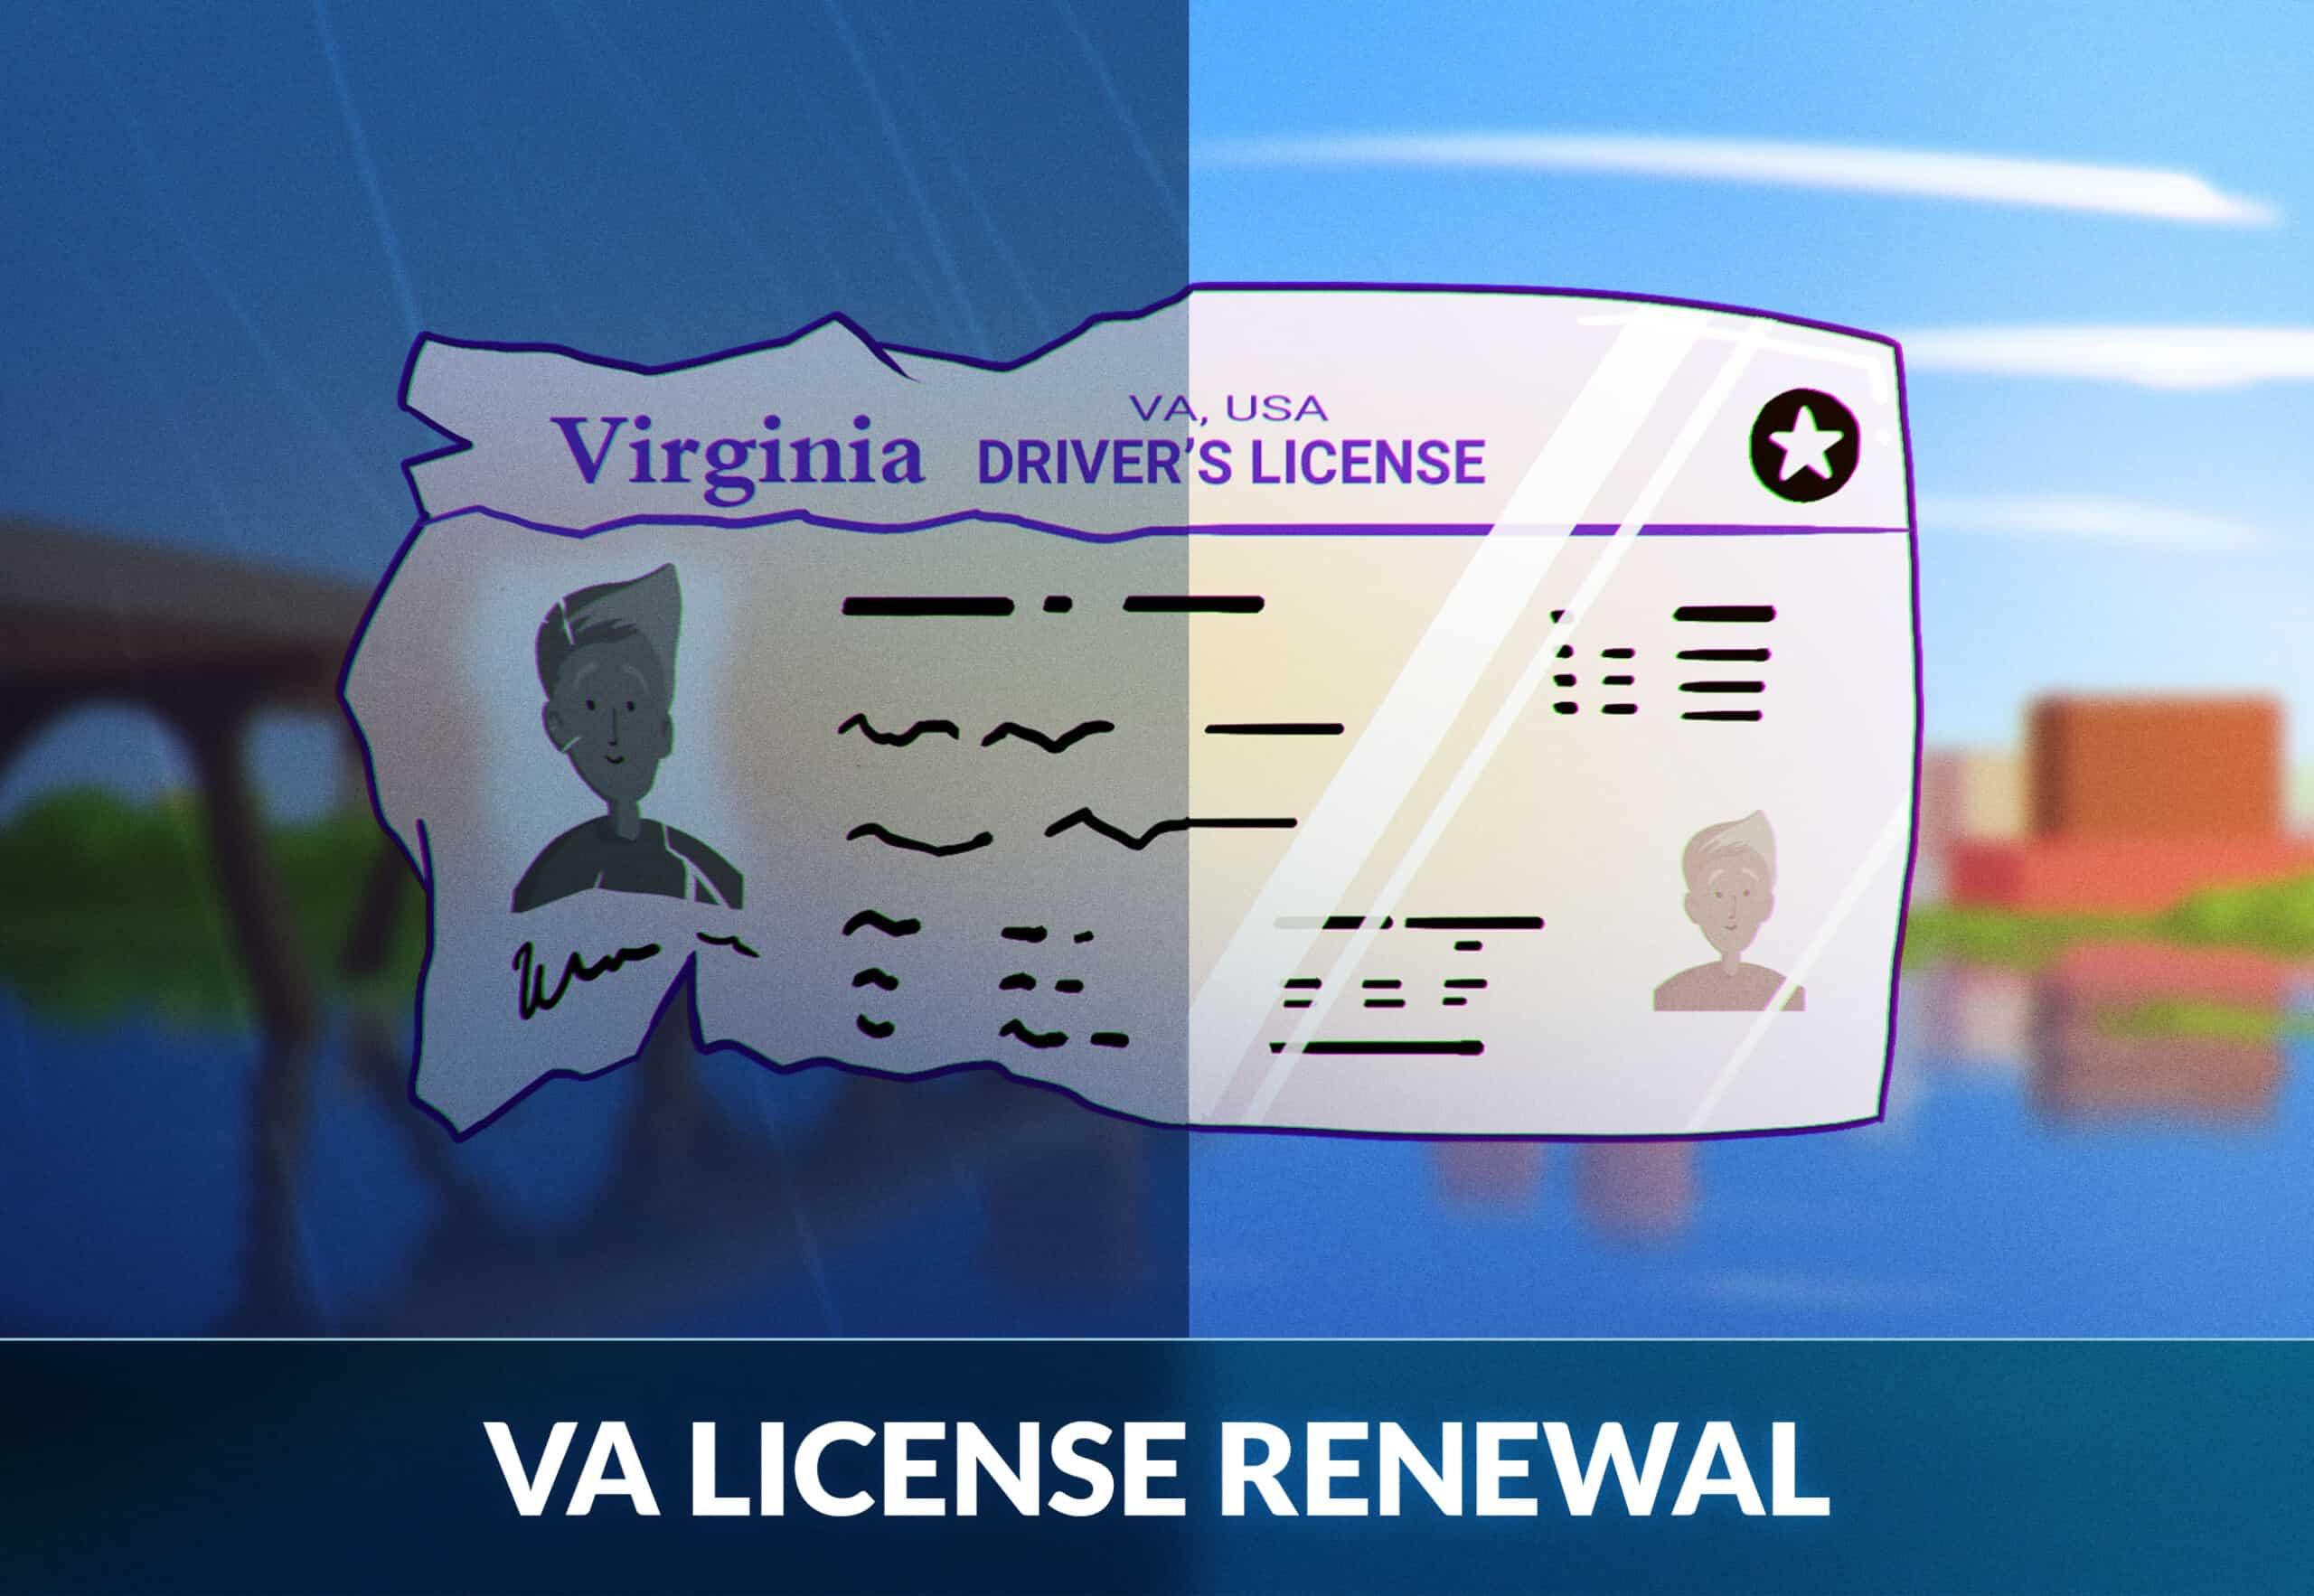 Virginia Driver's License Renewal